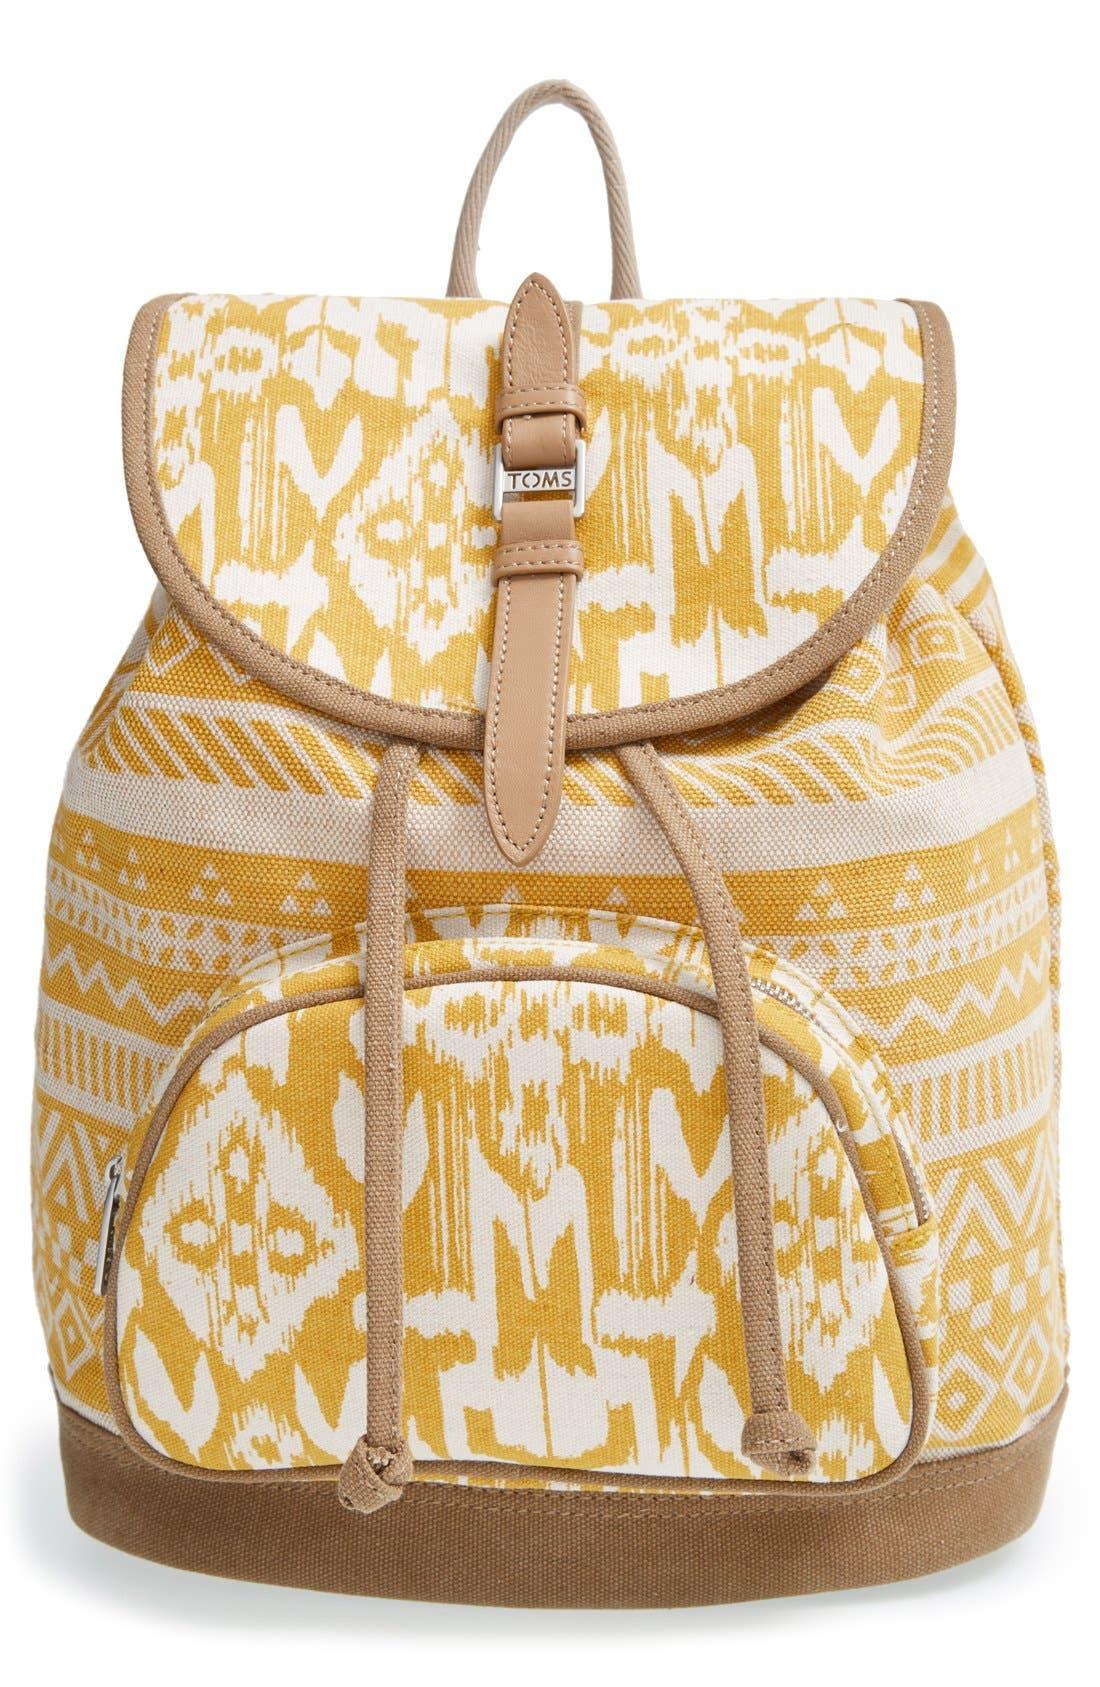 Alternate Image 1 Selected - TOMS 'Traveler' Canvas Backpack